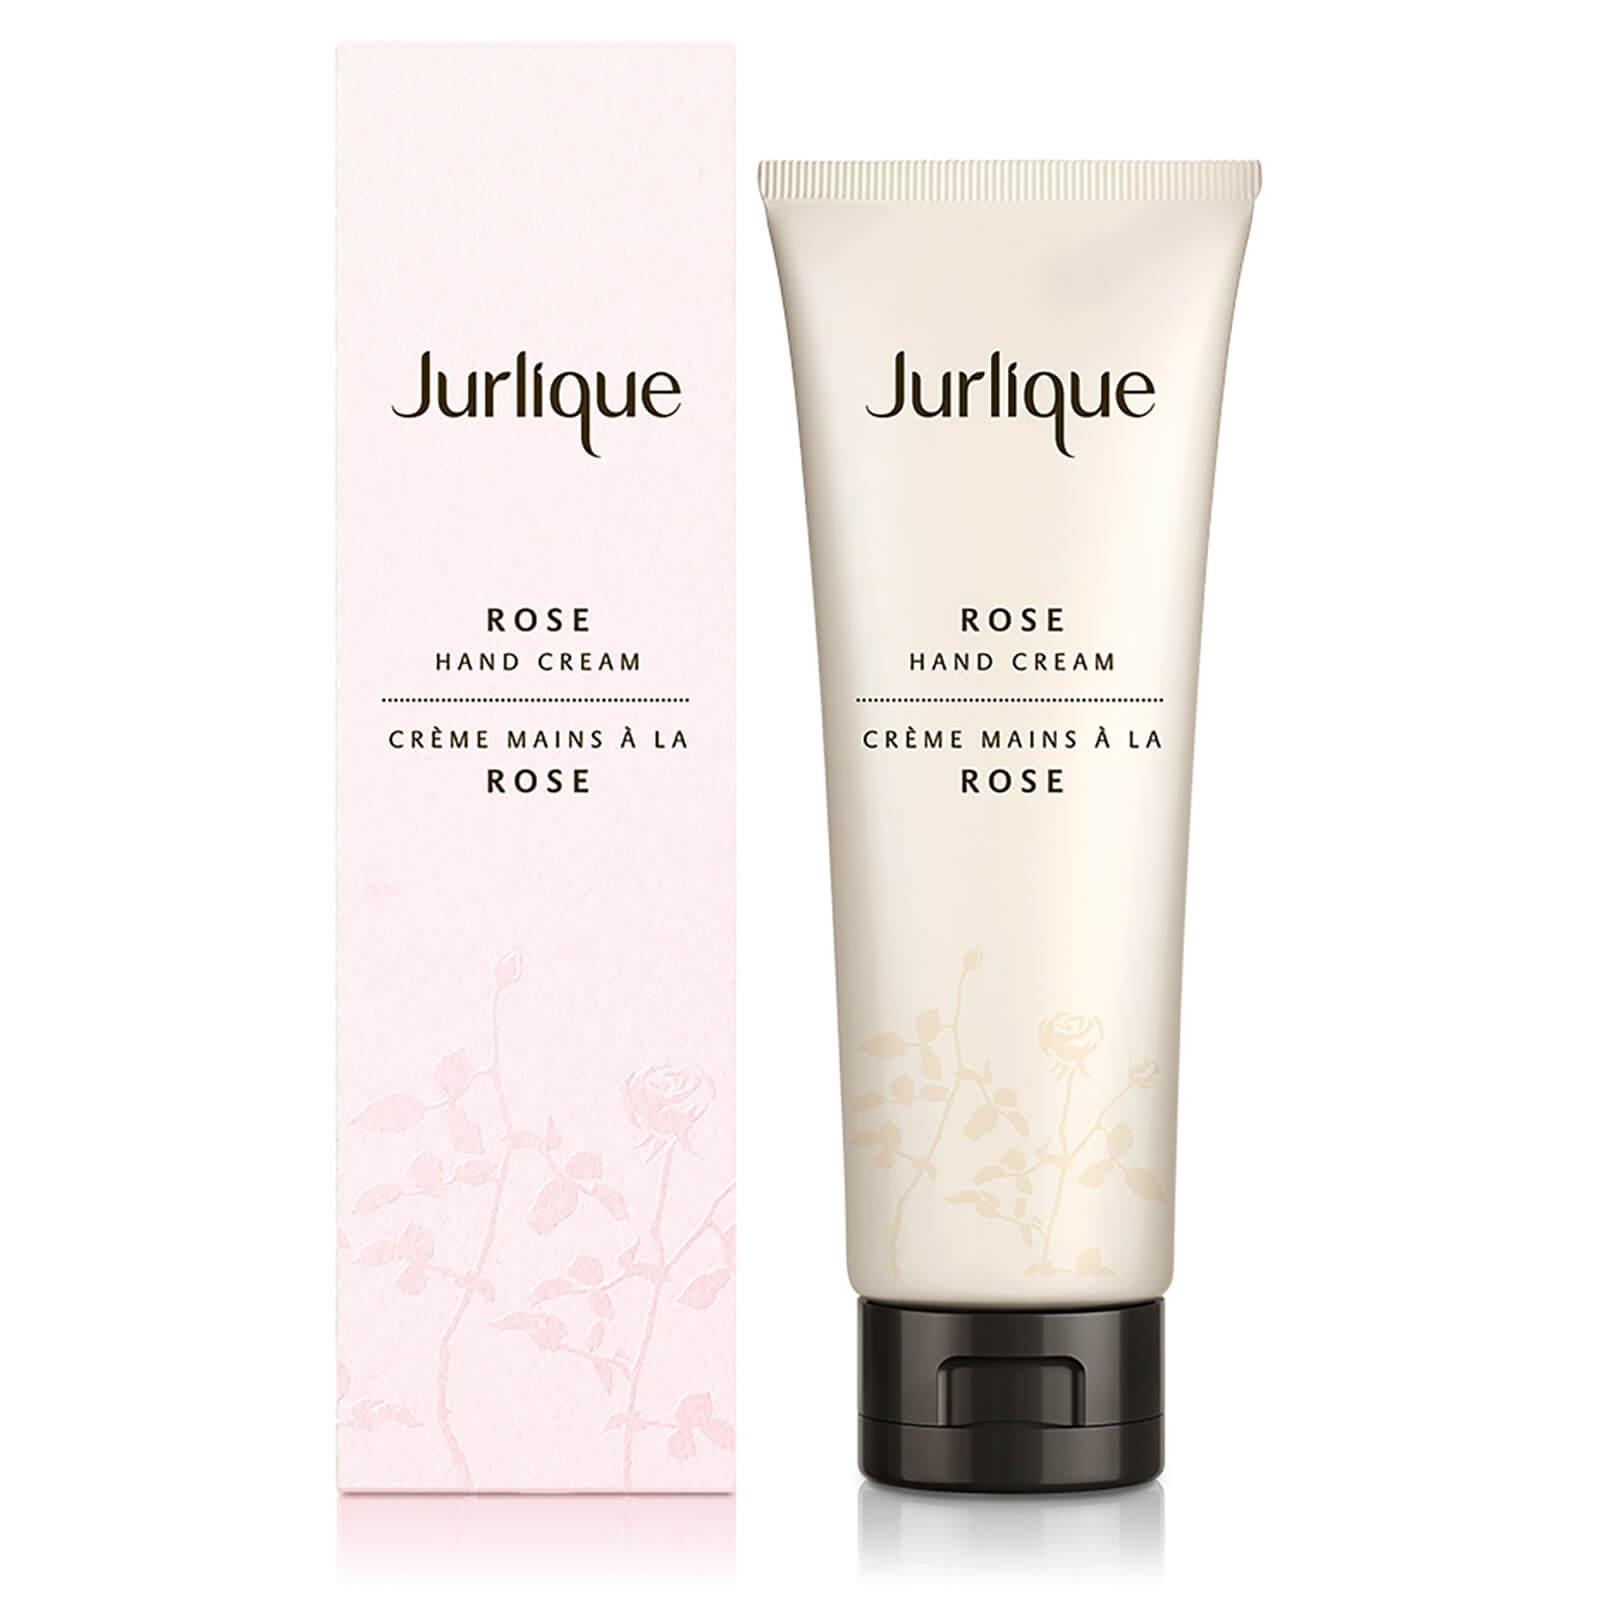 Rose Hand Cream (Travel Size) 30ml